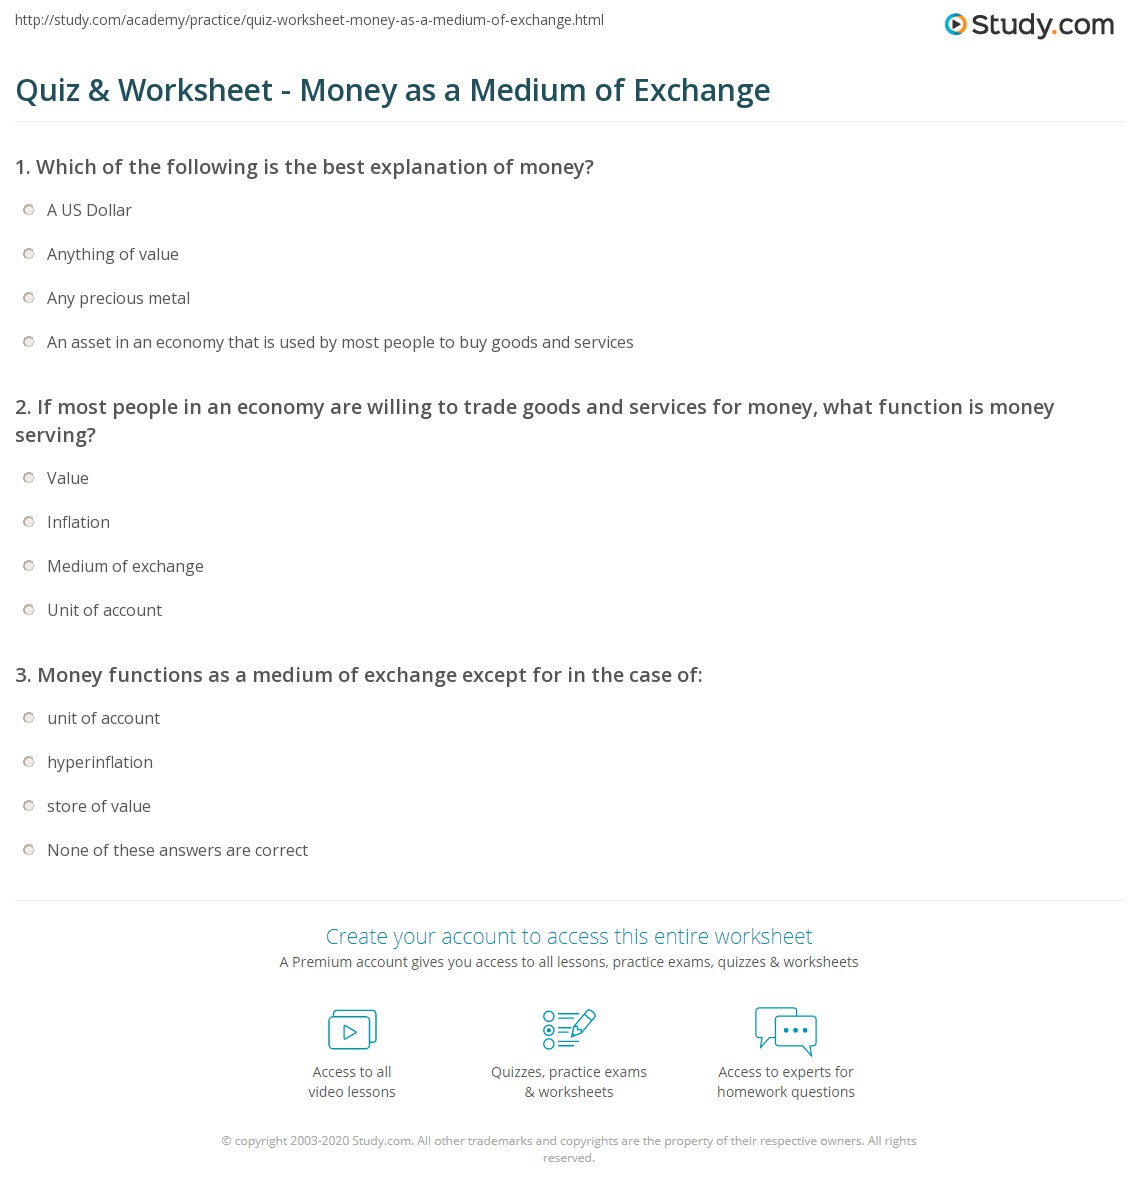 Worksheet Rule Of 72 Worksheet Grass Fedjp Worksheet